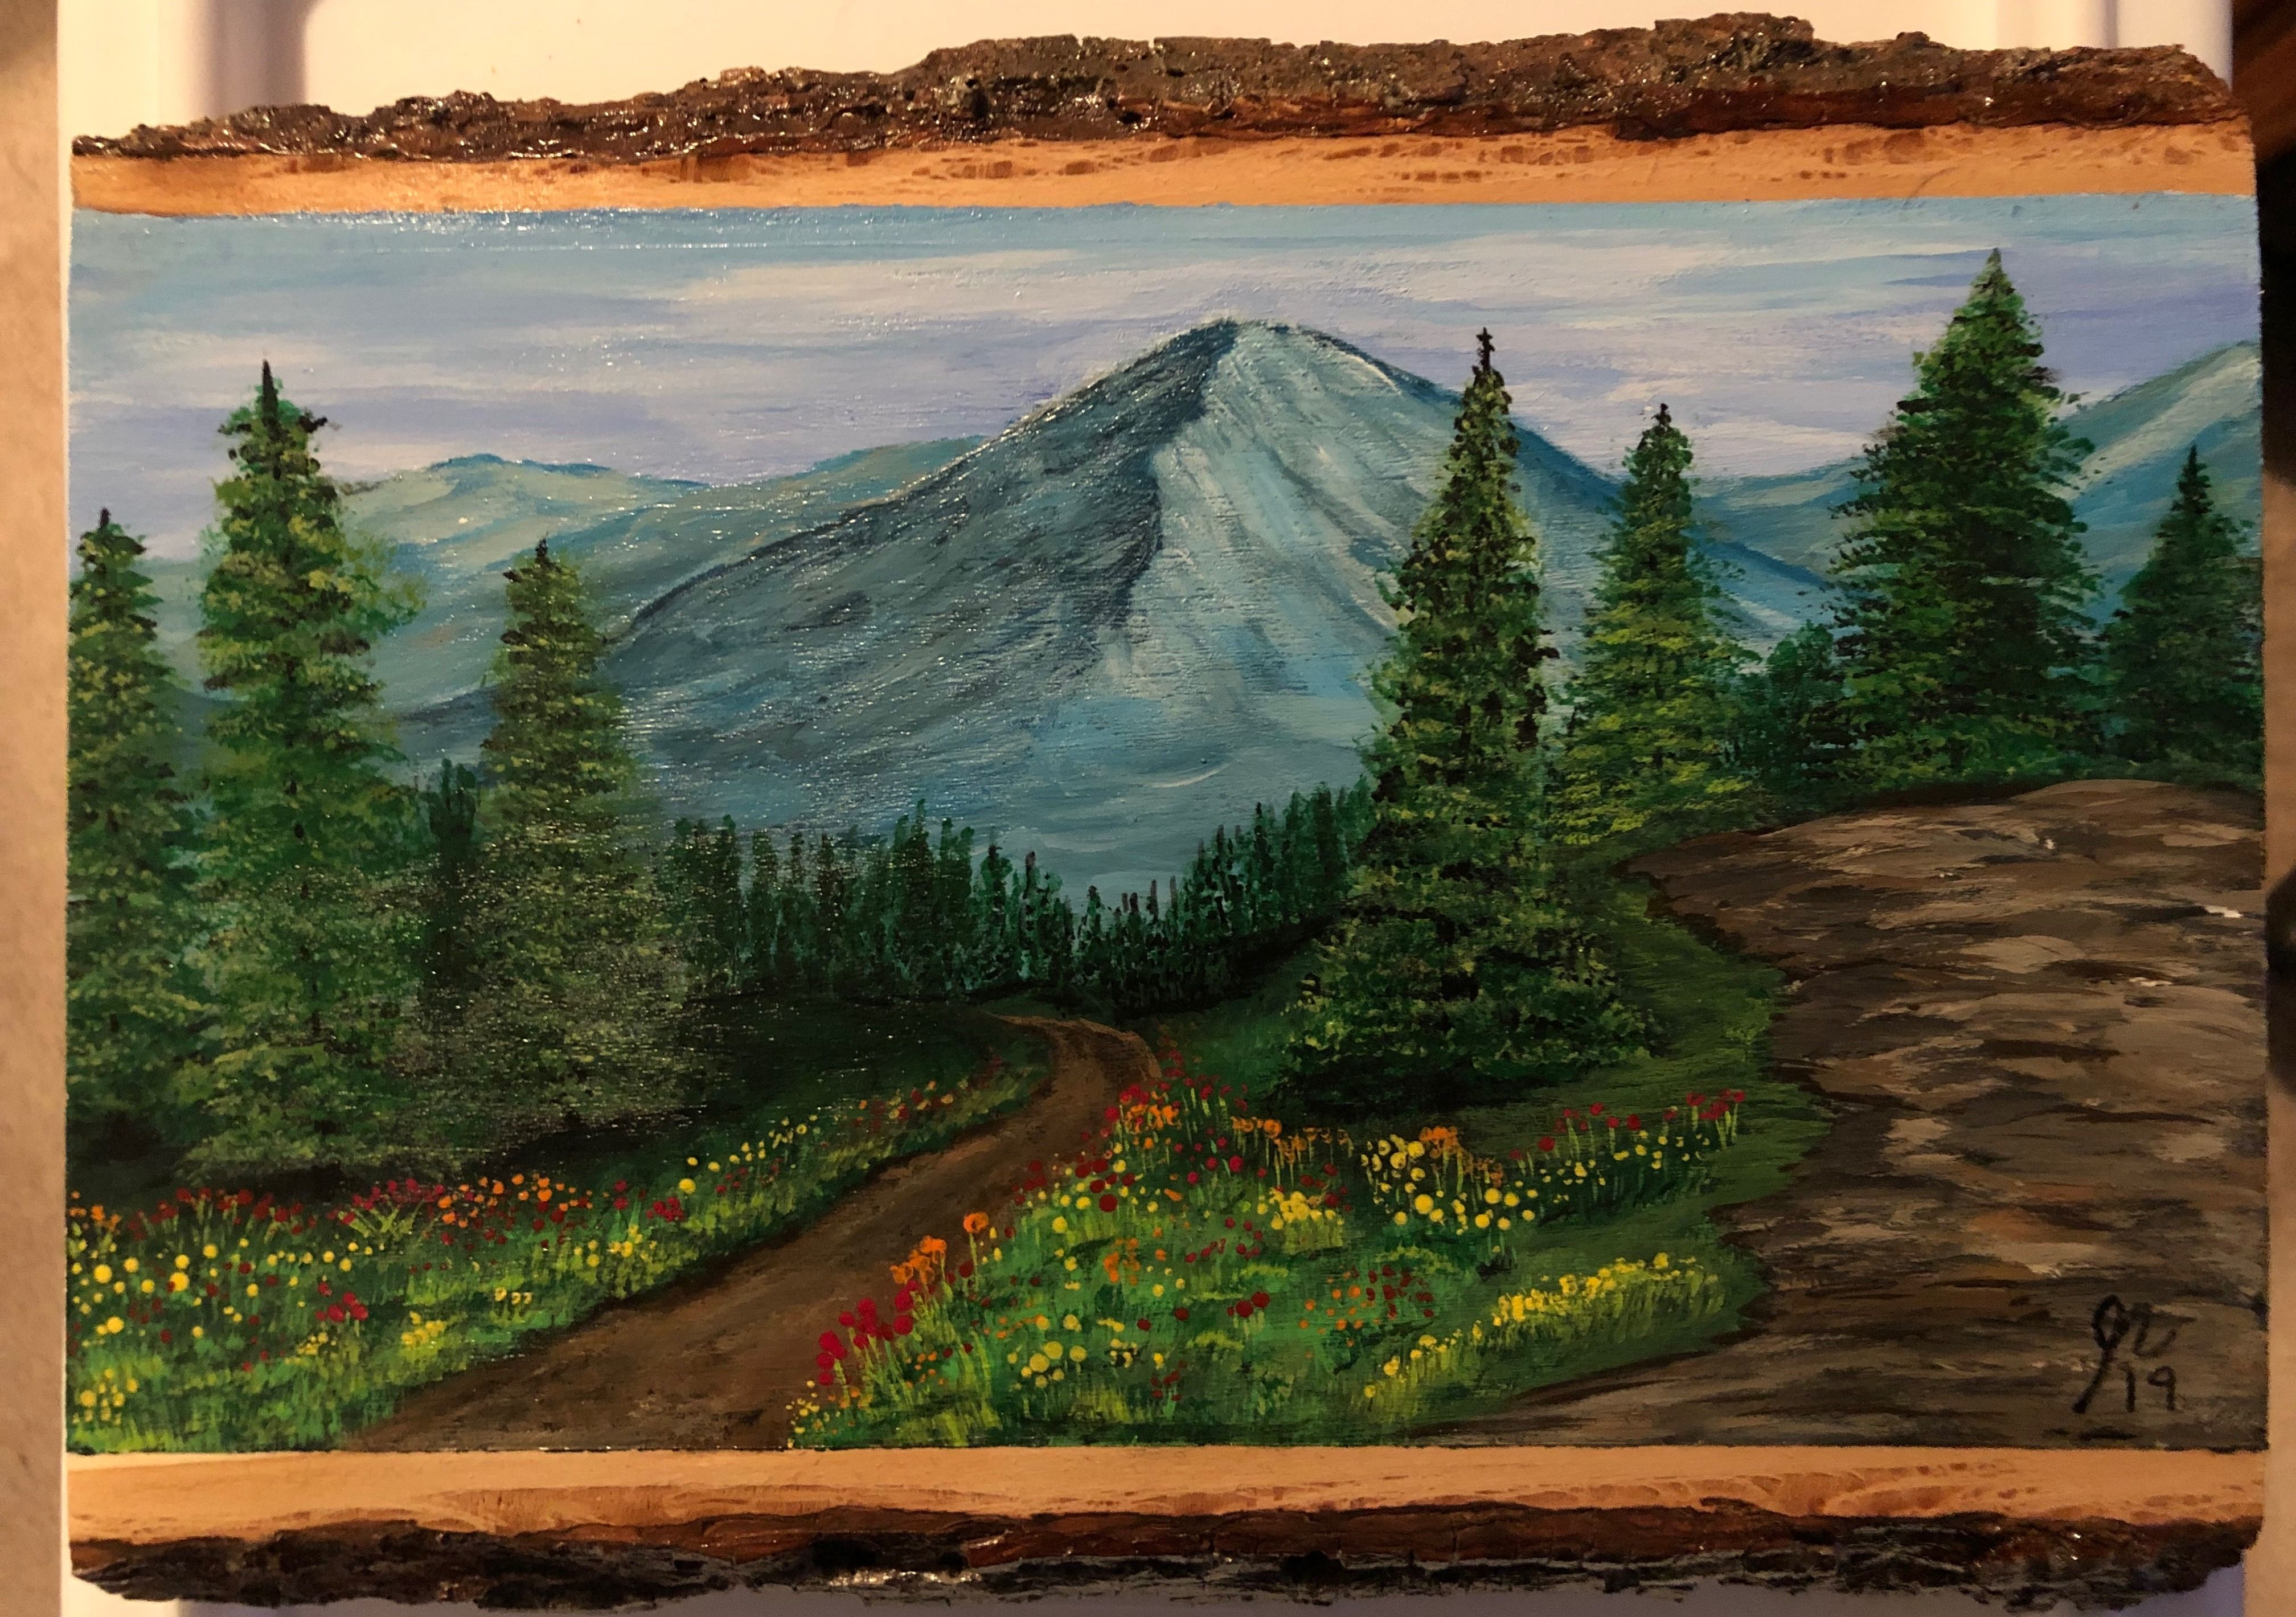 Mountain Scene Painted On Wood Mountain Scene Painting On Wood Mountains